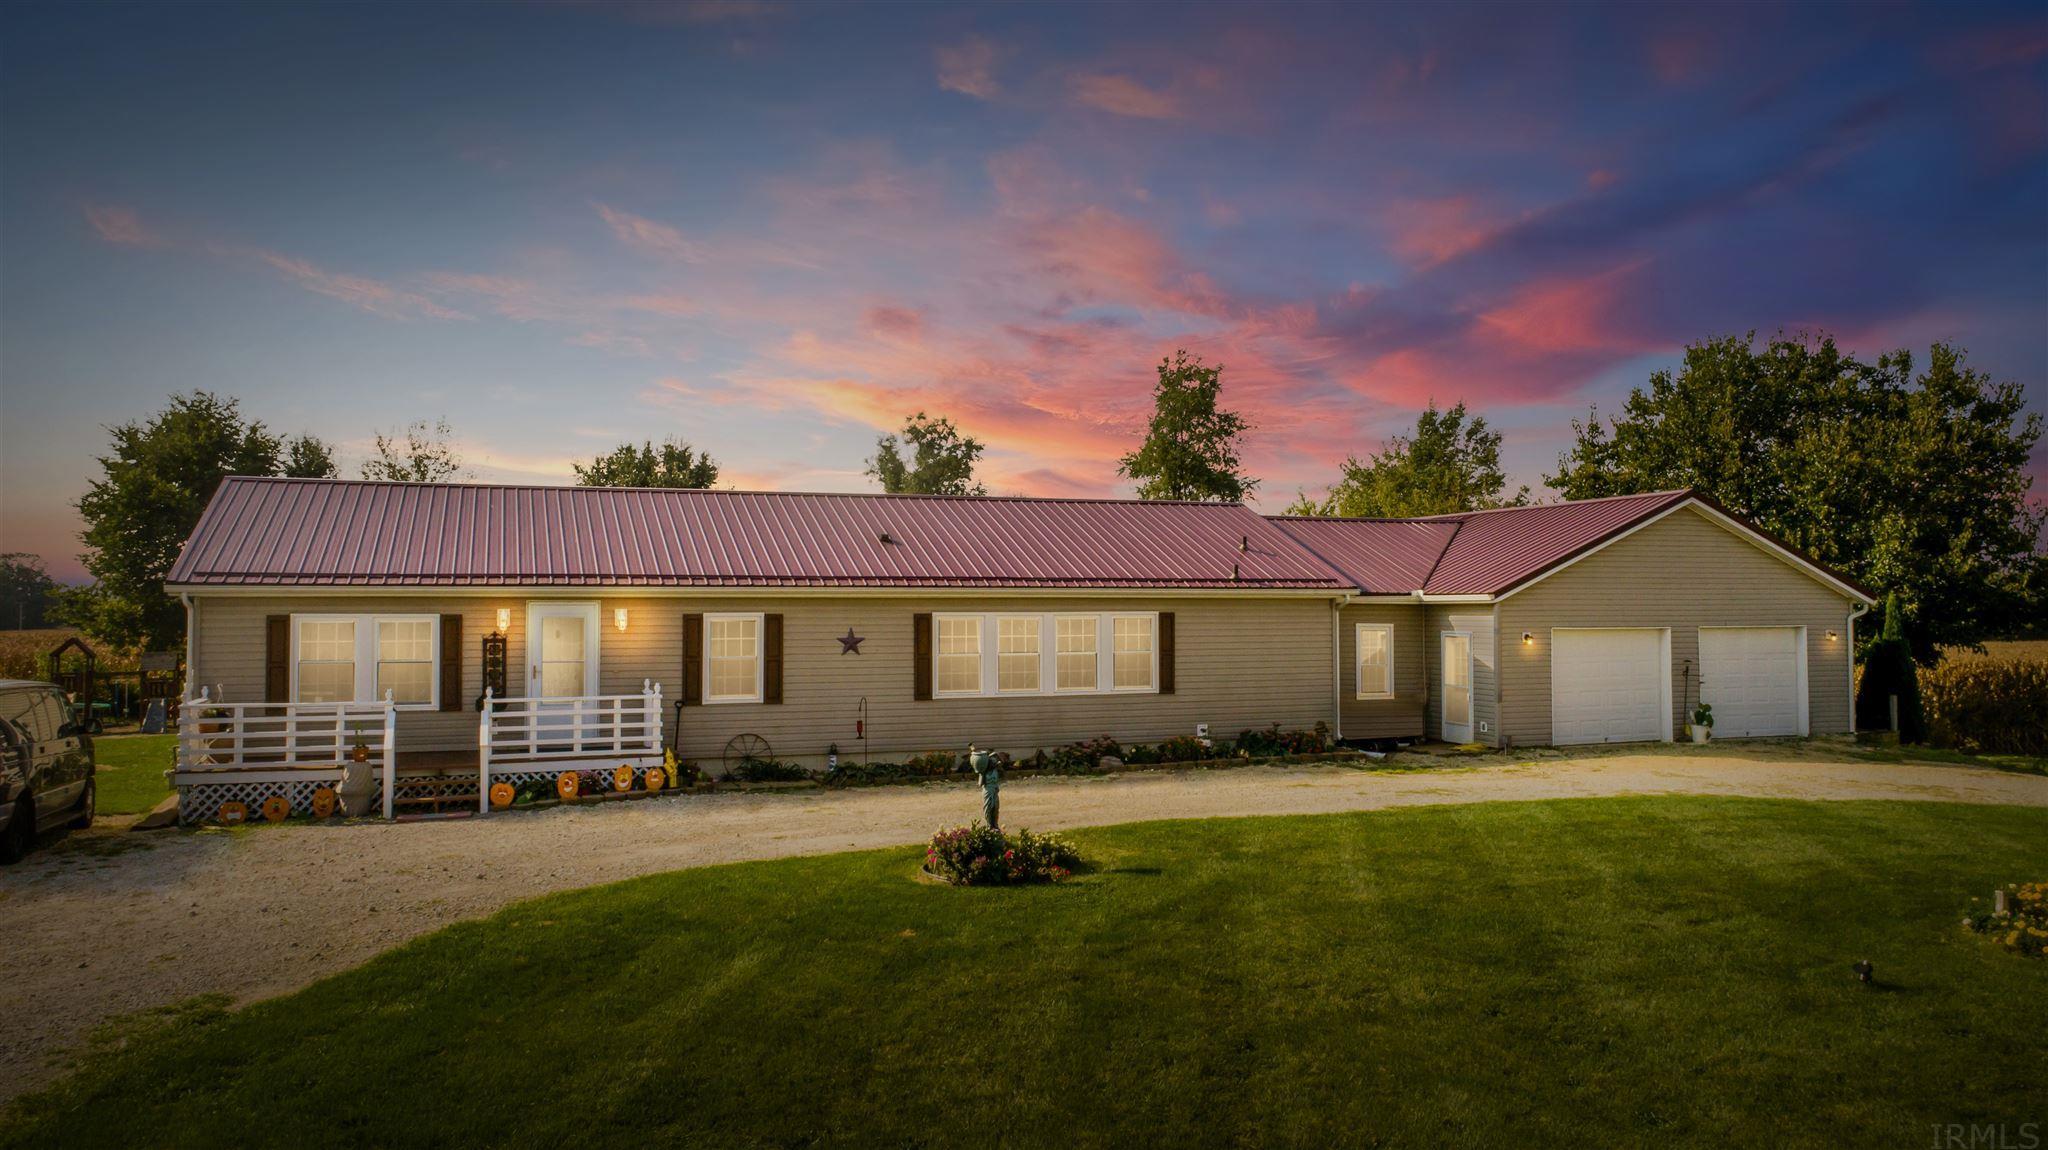 2960 E 450, LaGrange County - Listing 201843093 | Mike Thomas ...